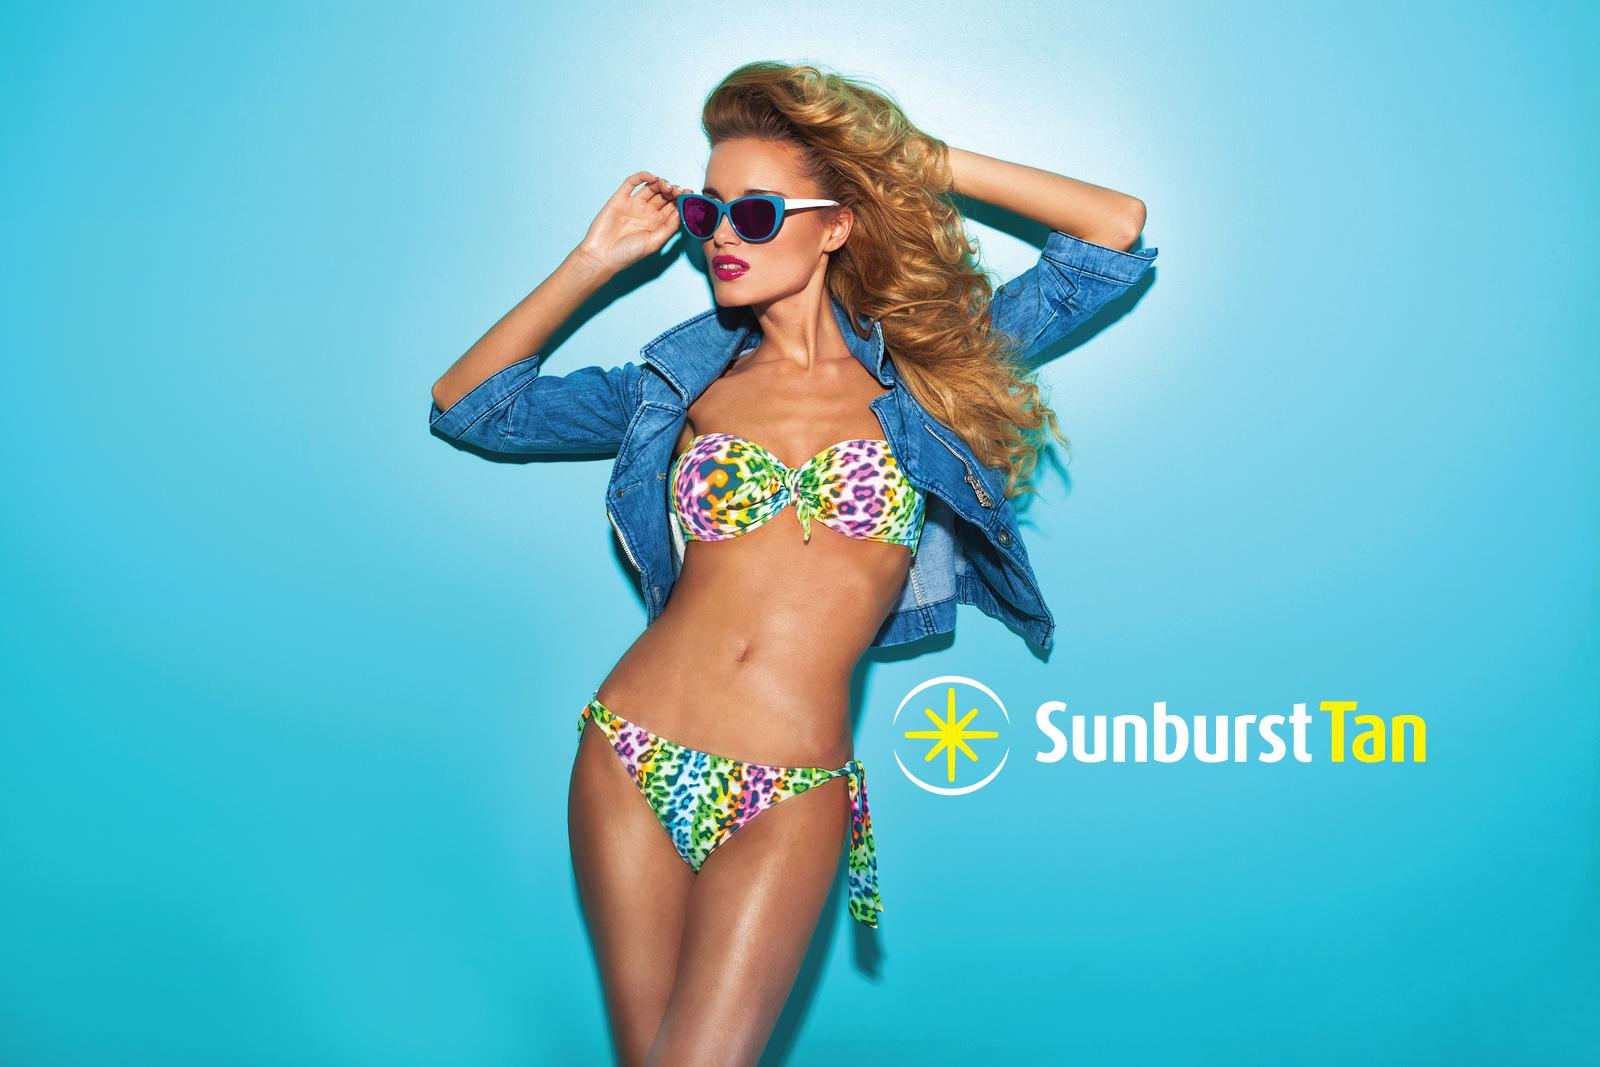 Sunburst Tan